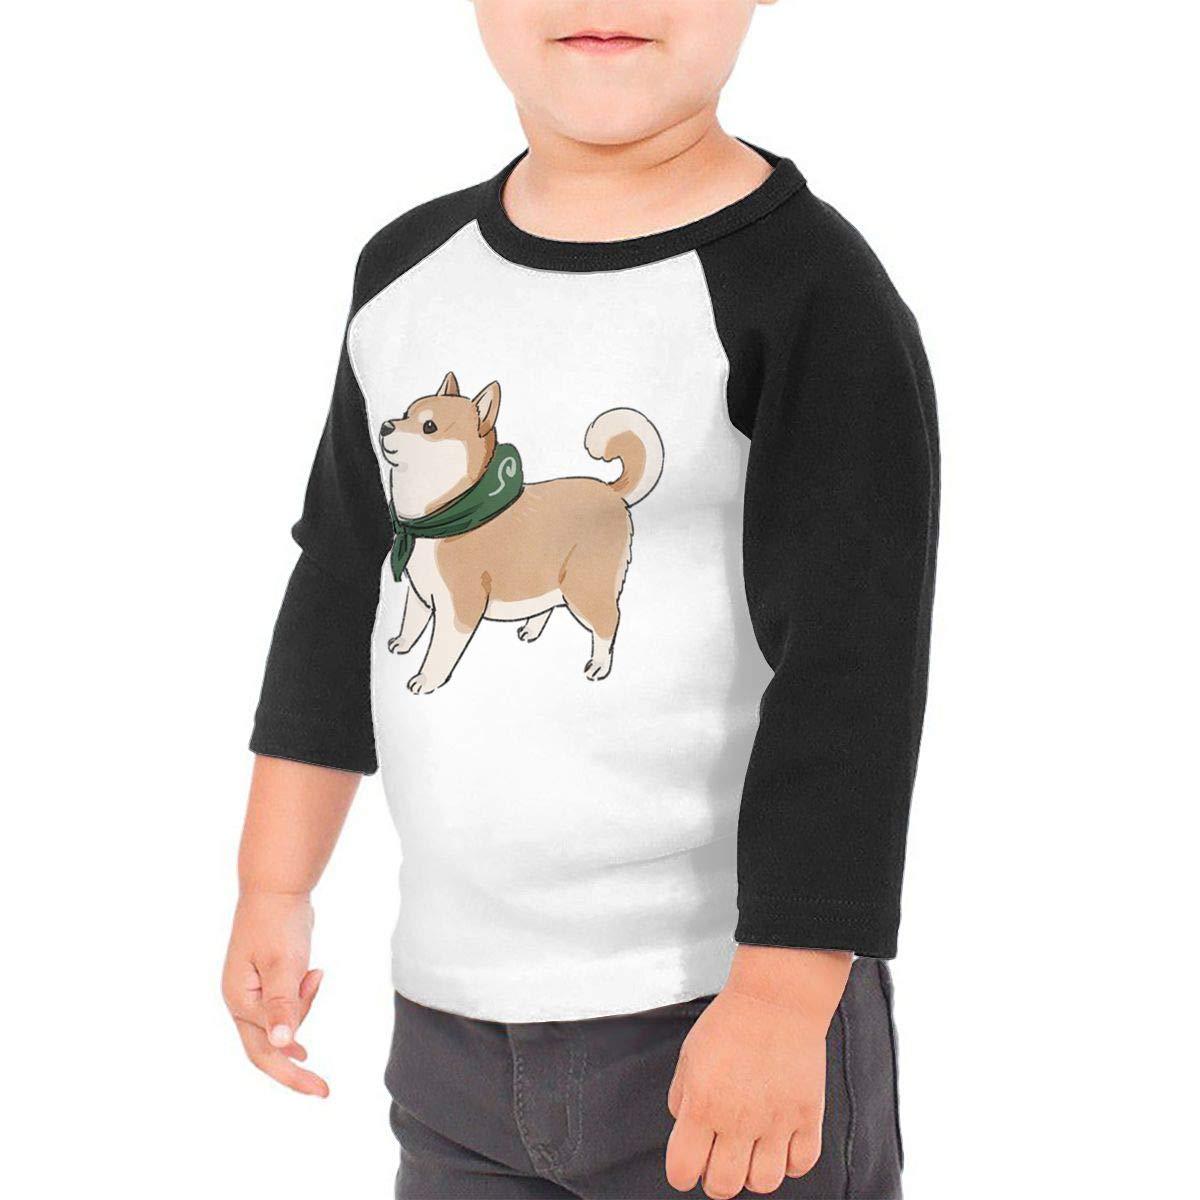 Cute Shiba Inu Kids Jersey Raglan T-Shirt Children 3//4 Sleeve Baseball Shirt Top